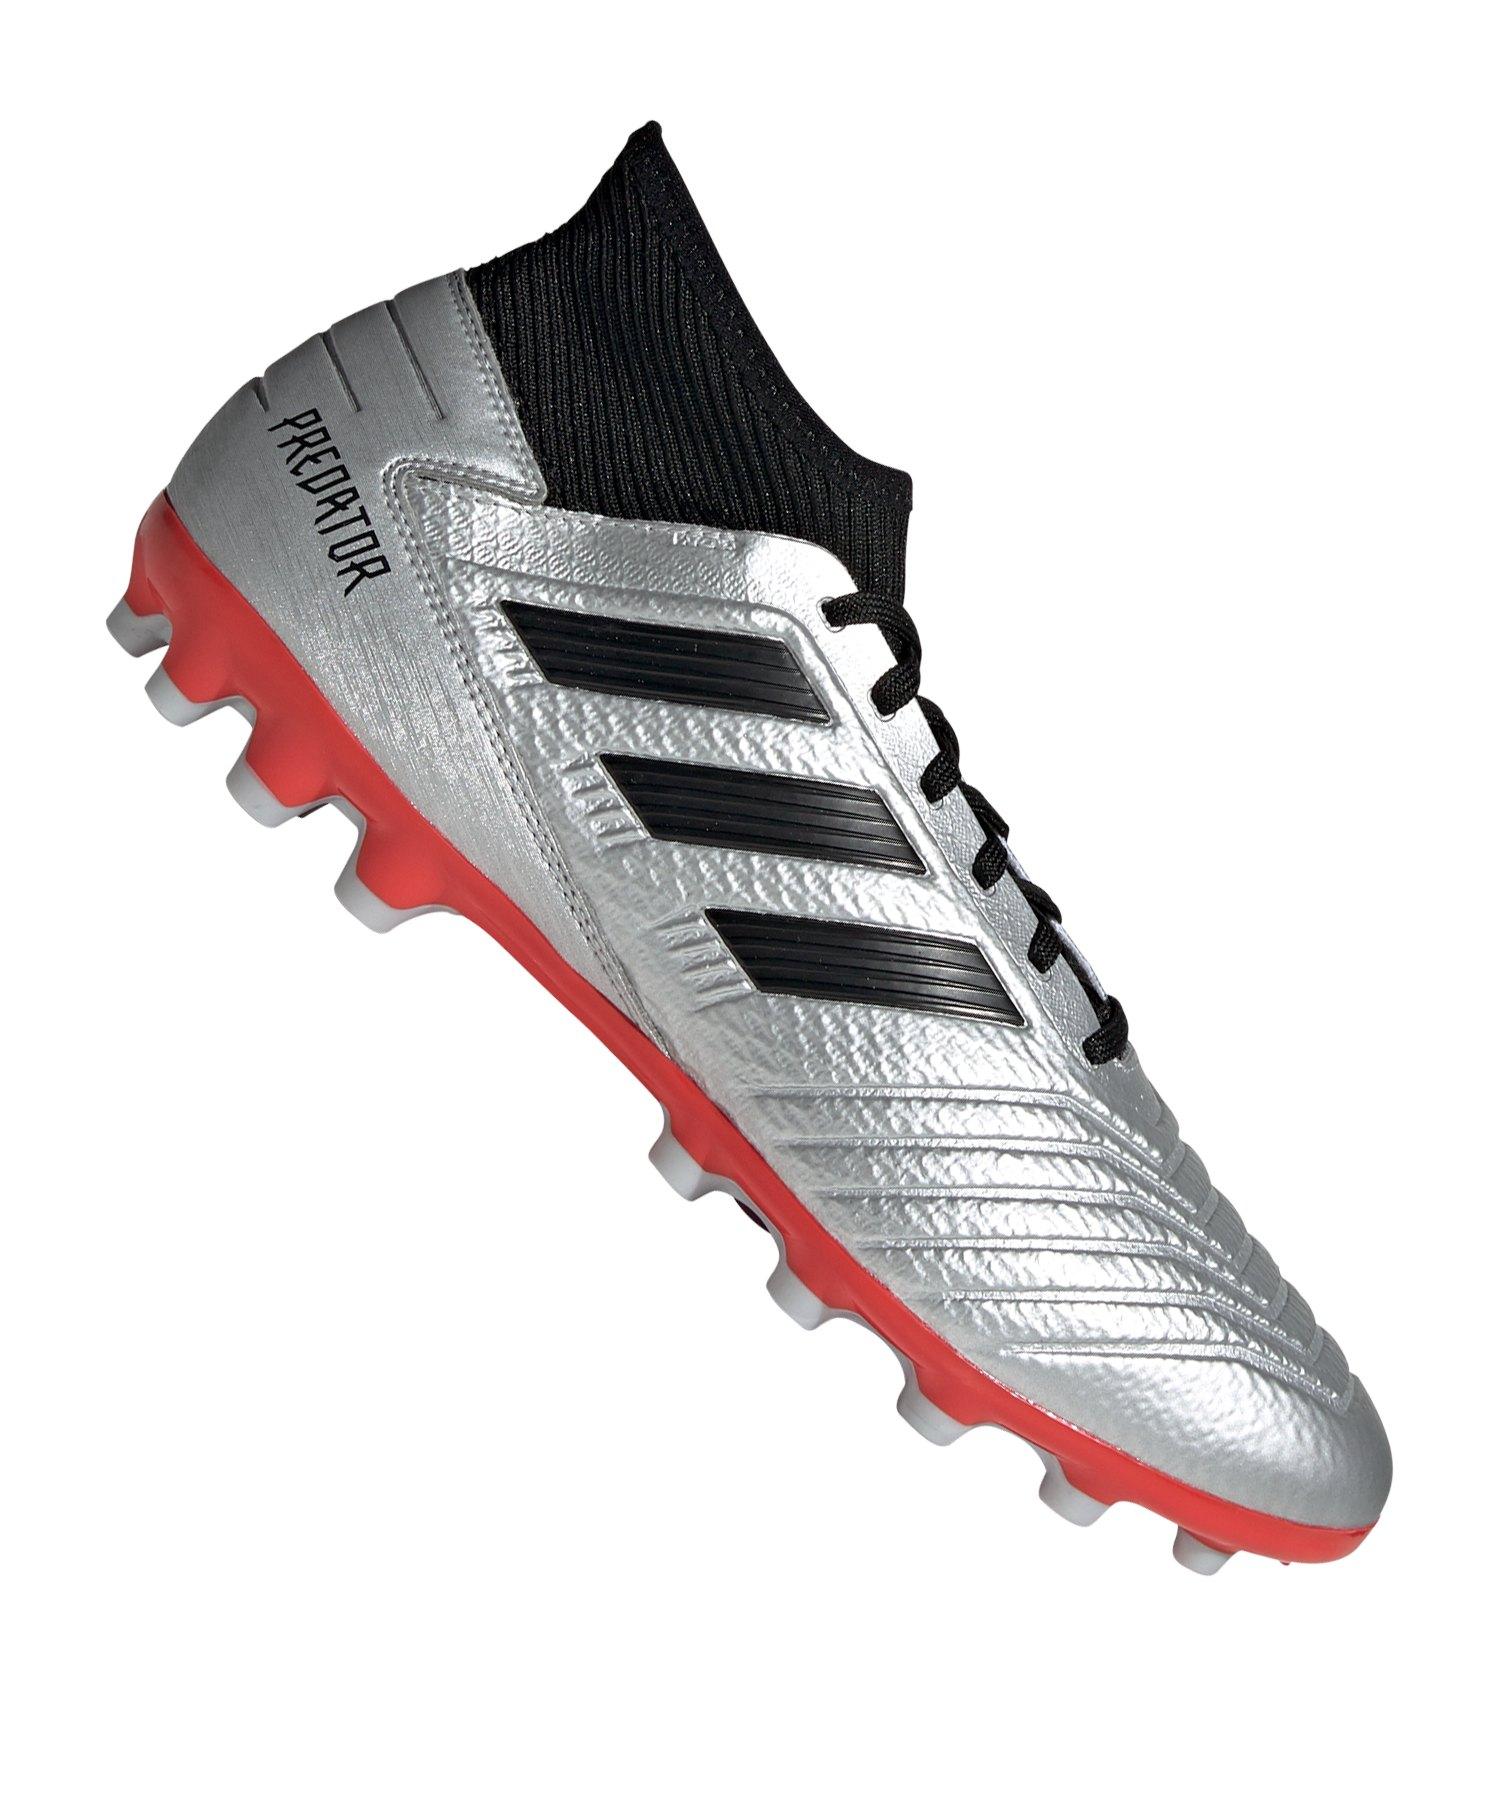 Adidas Predator 19.3 AG Fußballschuhe Herren